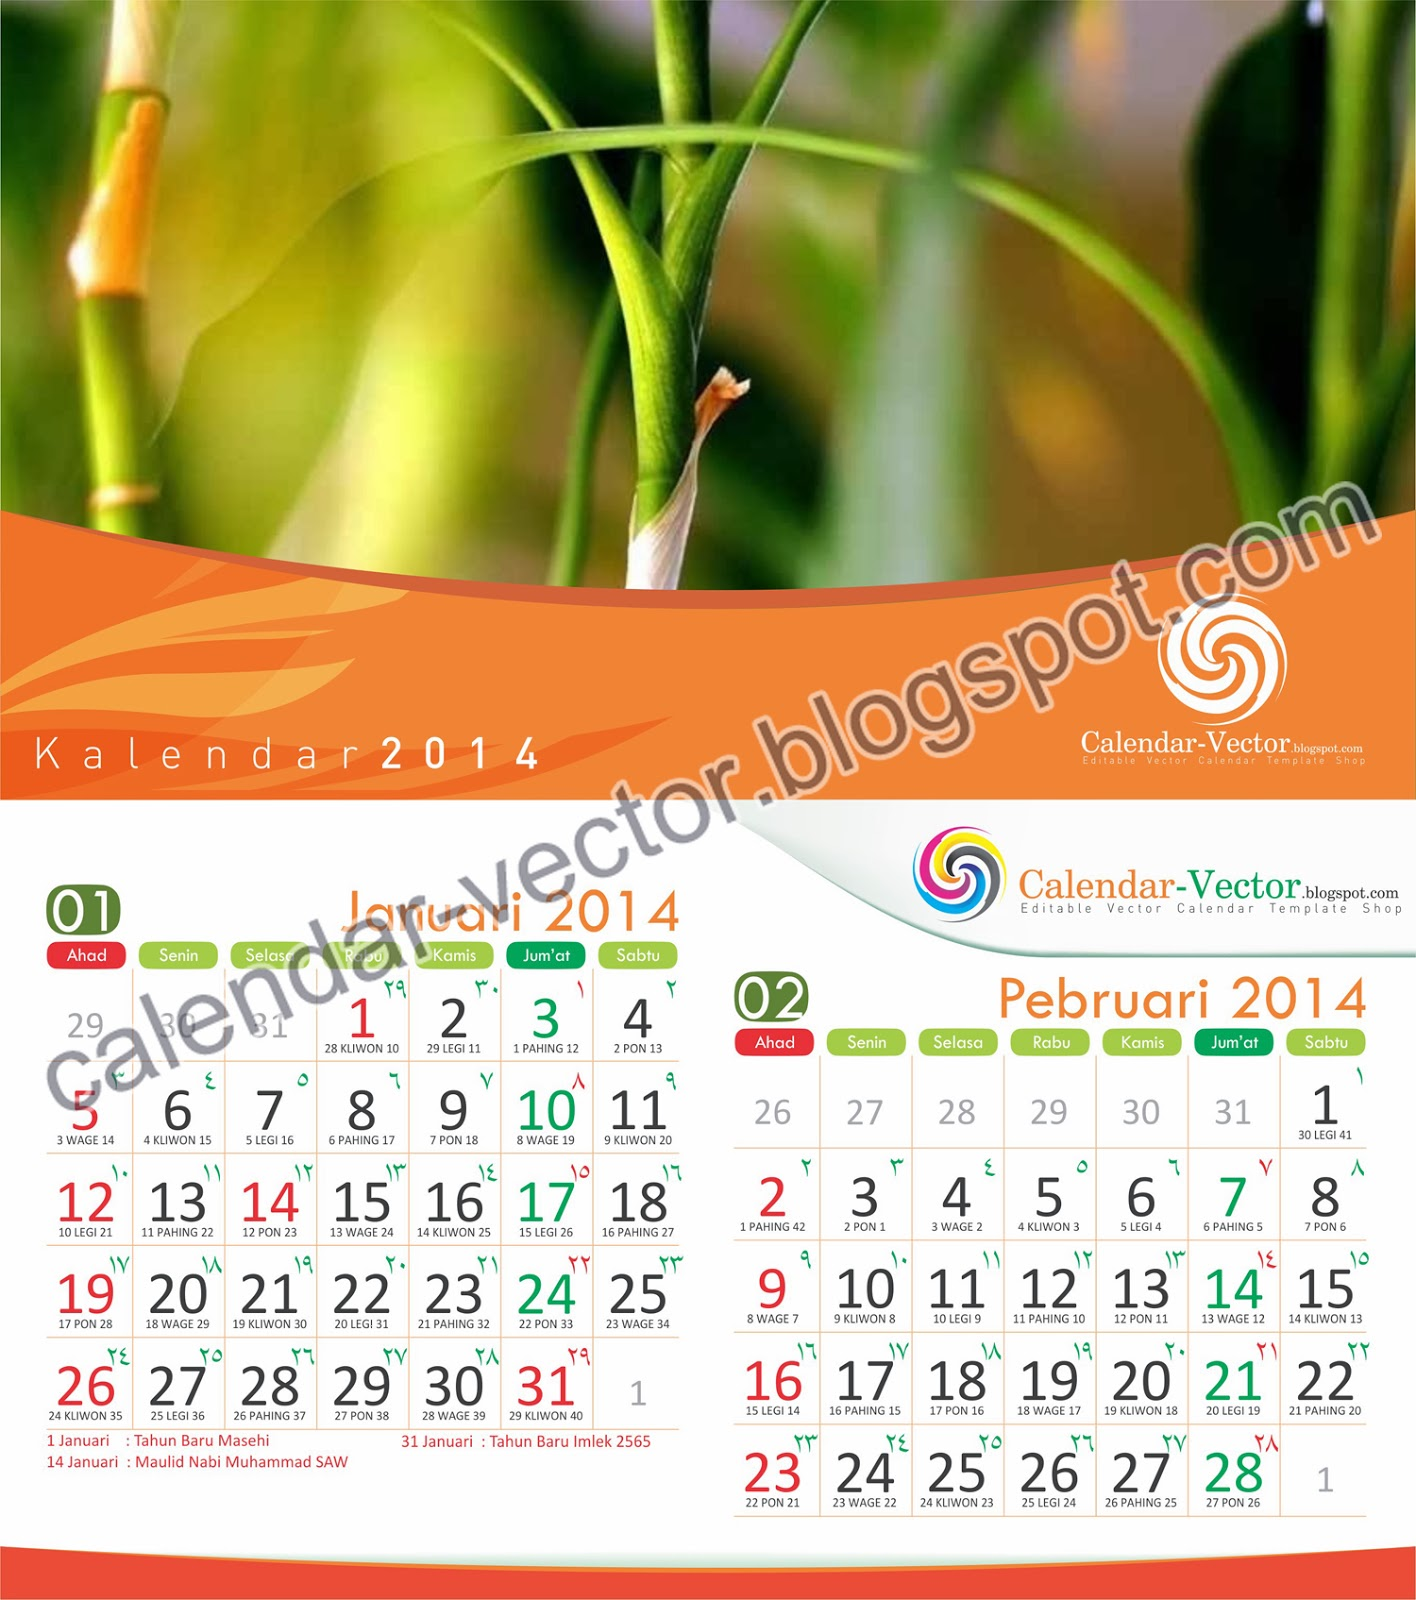 ME-2014-03+template+kalender+meja+2014+calendar+templates+calendar